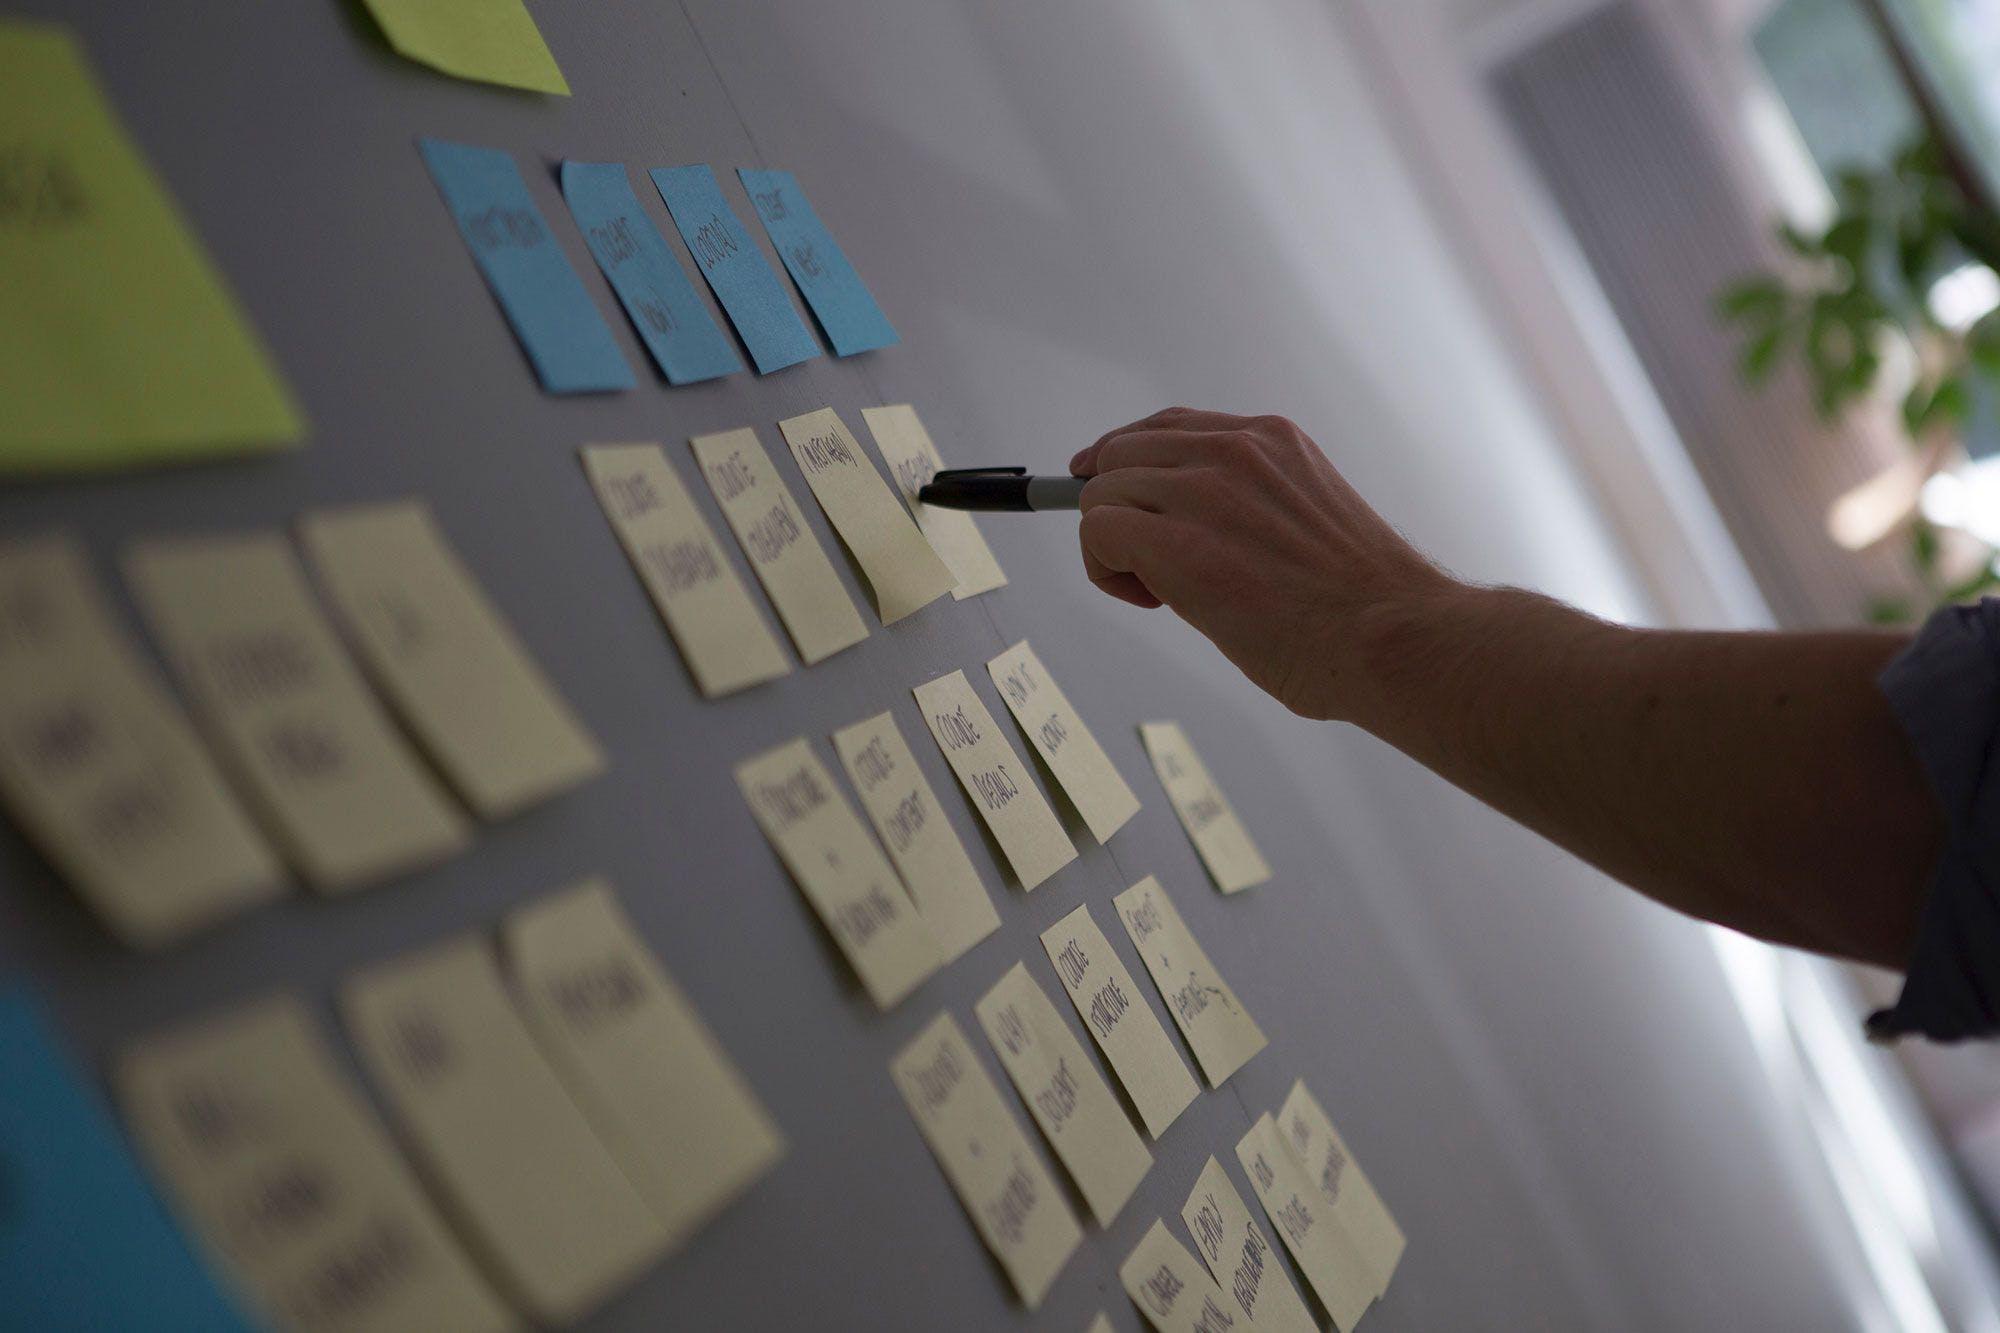 Zengeti usability insights on post-its